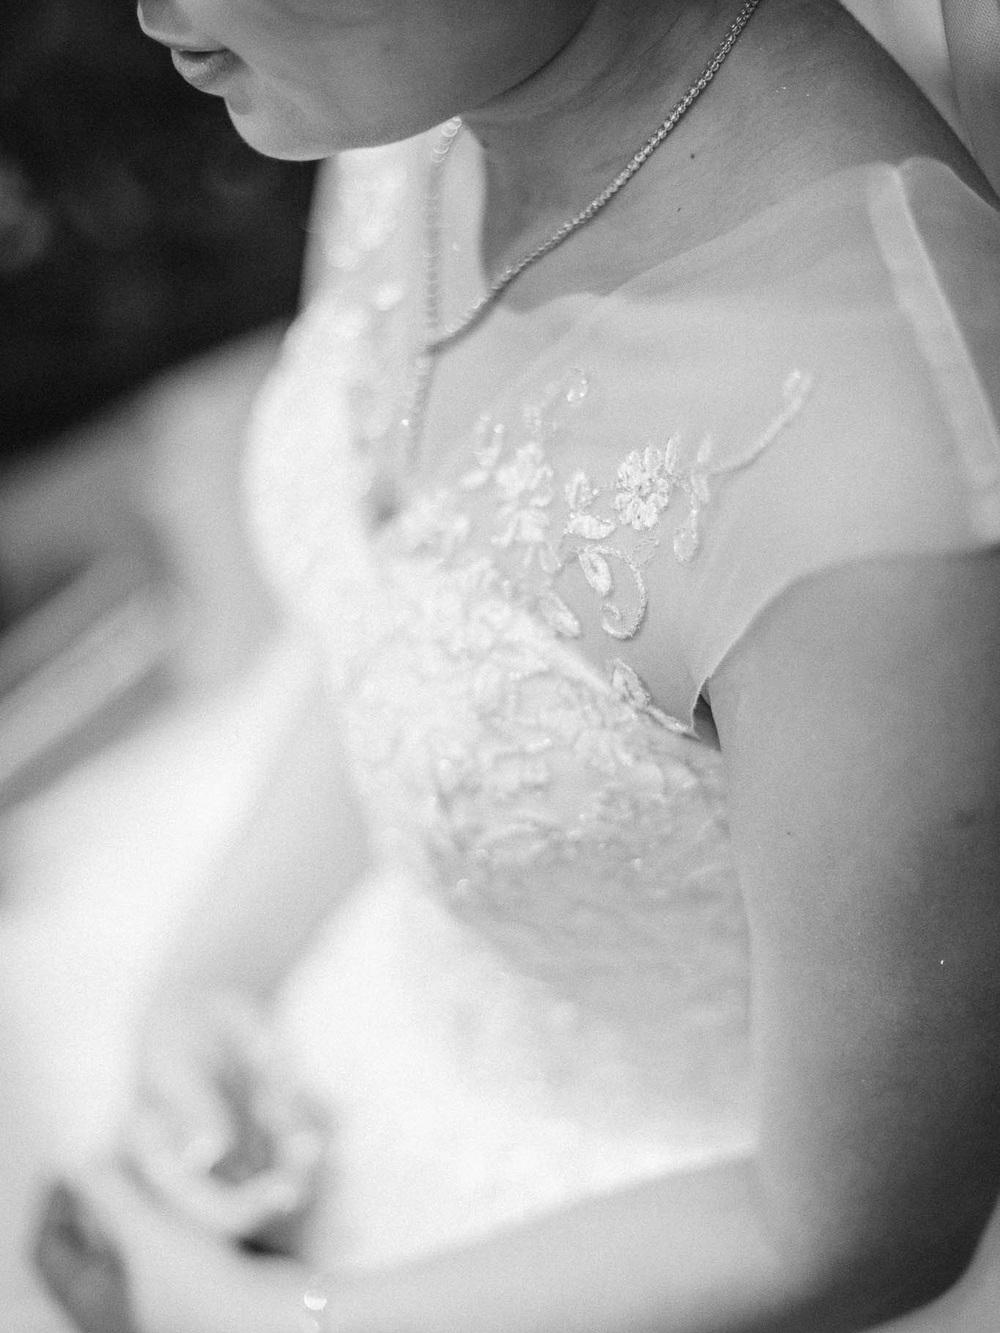 singapore-wedding-photographer-malay-indian-pre-wedding-travel-wmt-2015-jeremy-larissa-07.jpg